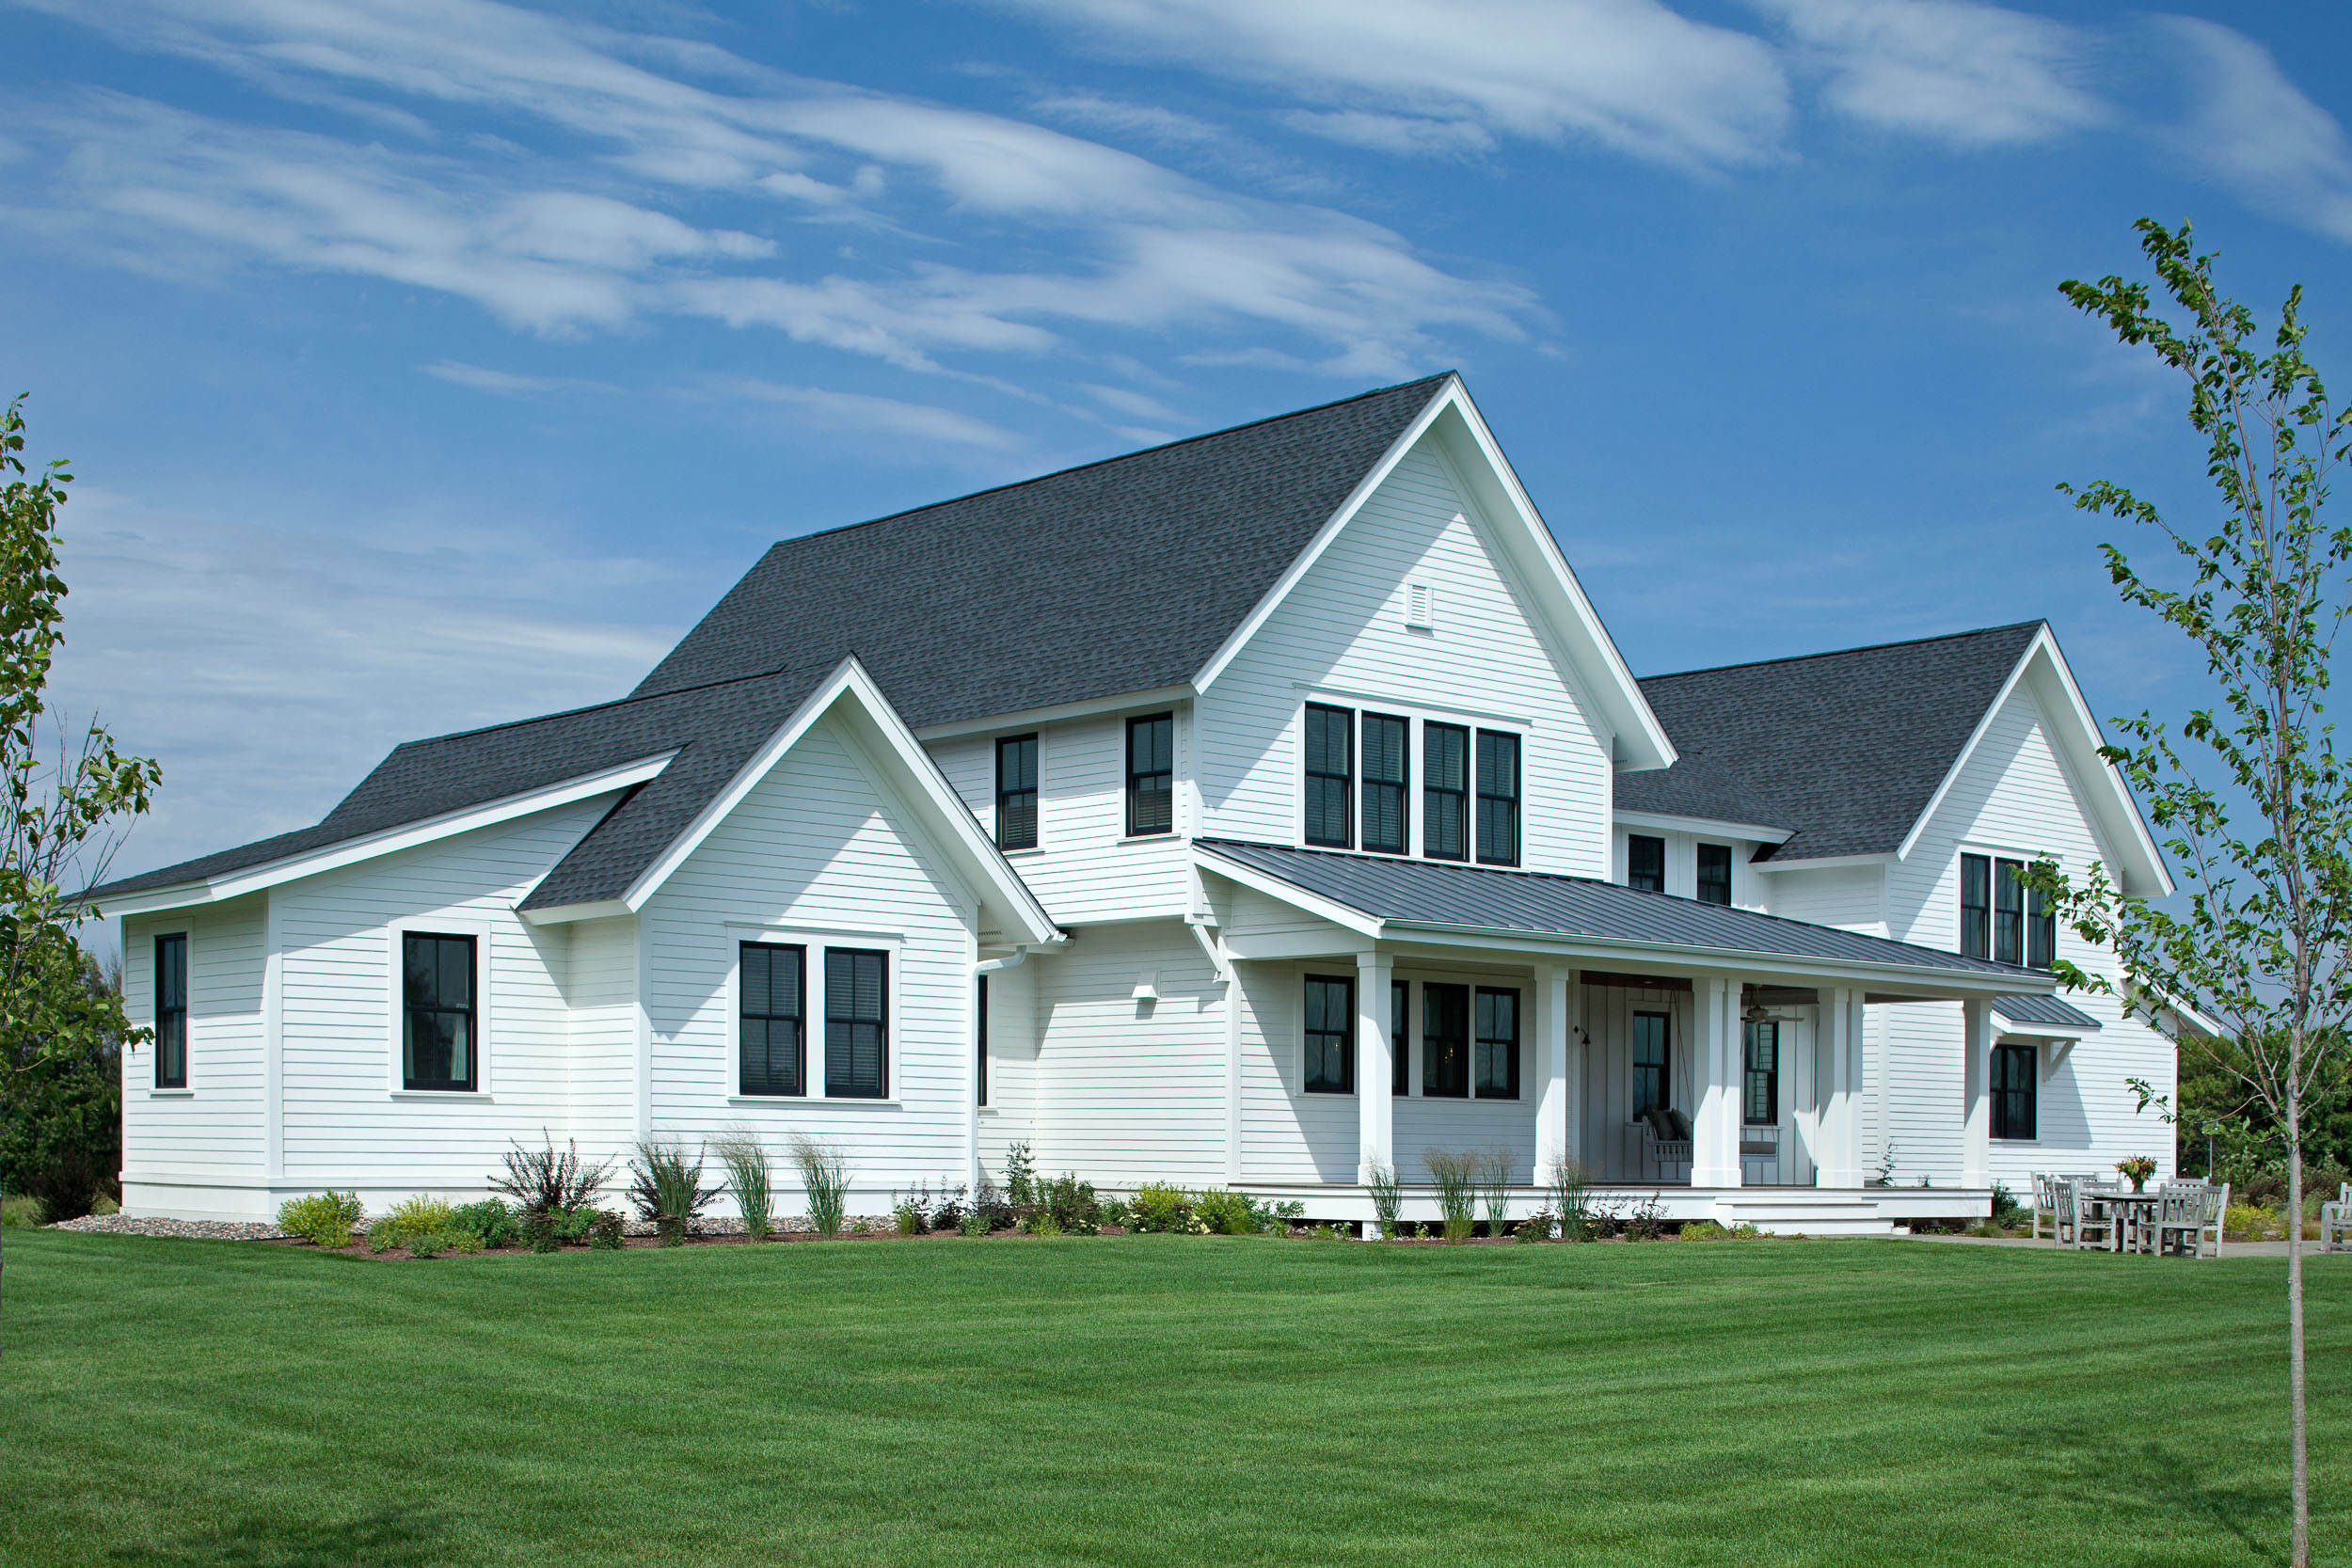 Modern Farmhouse Exterior Image